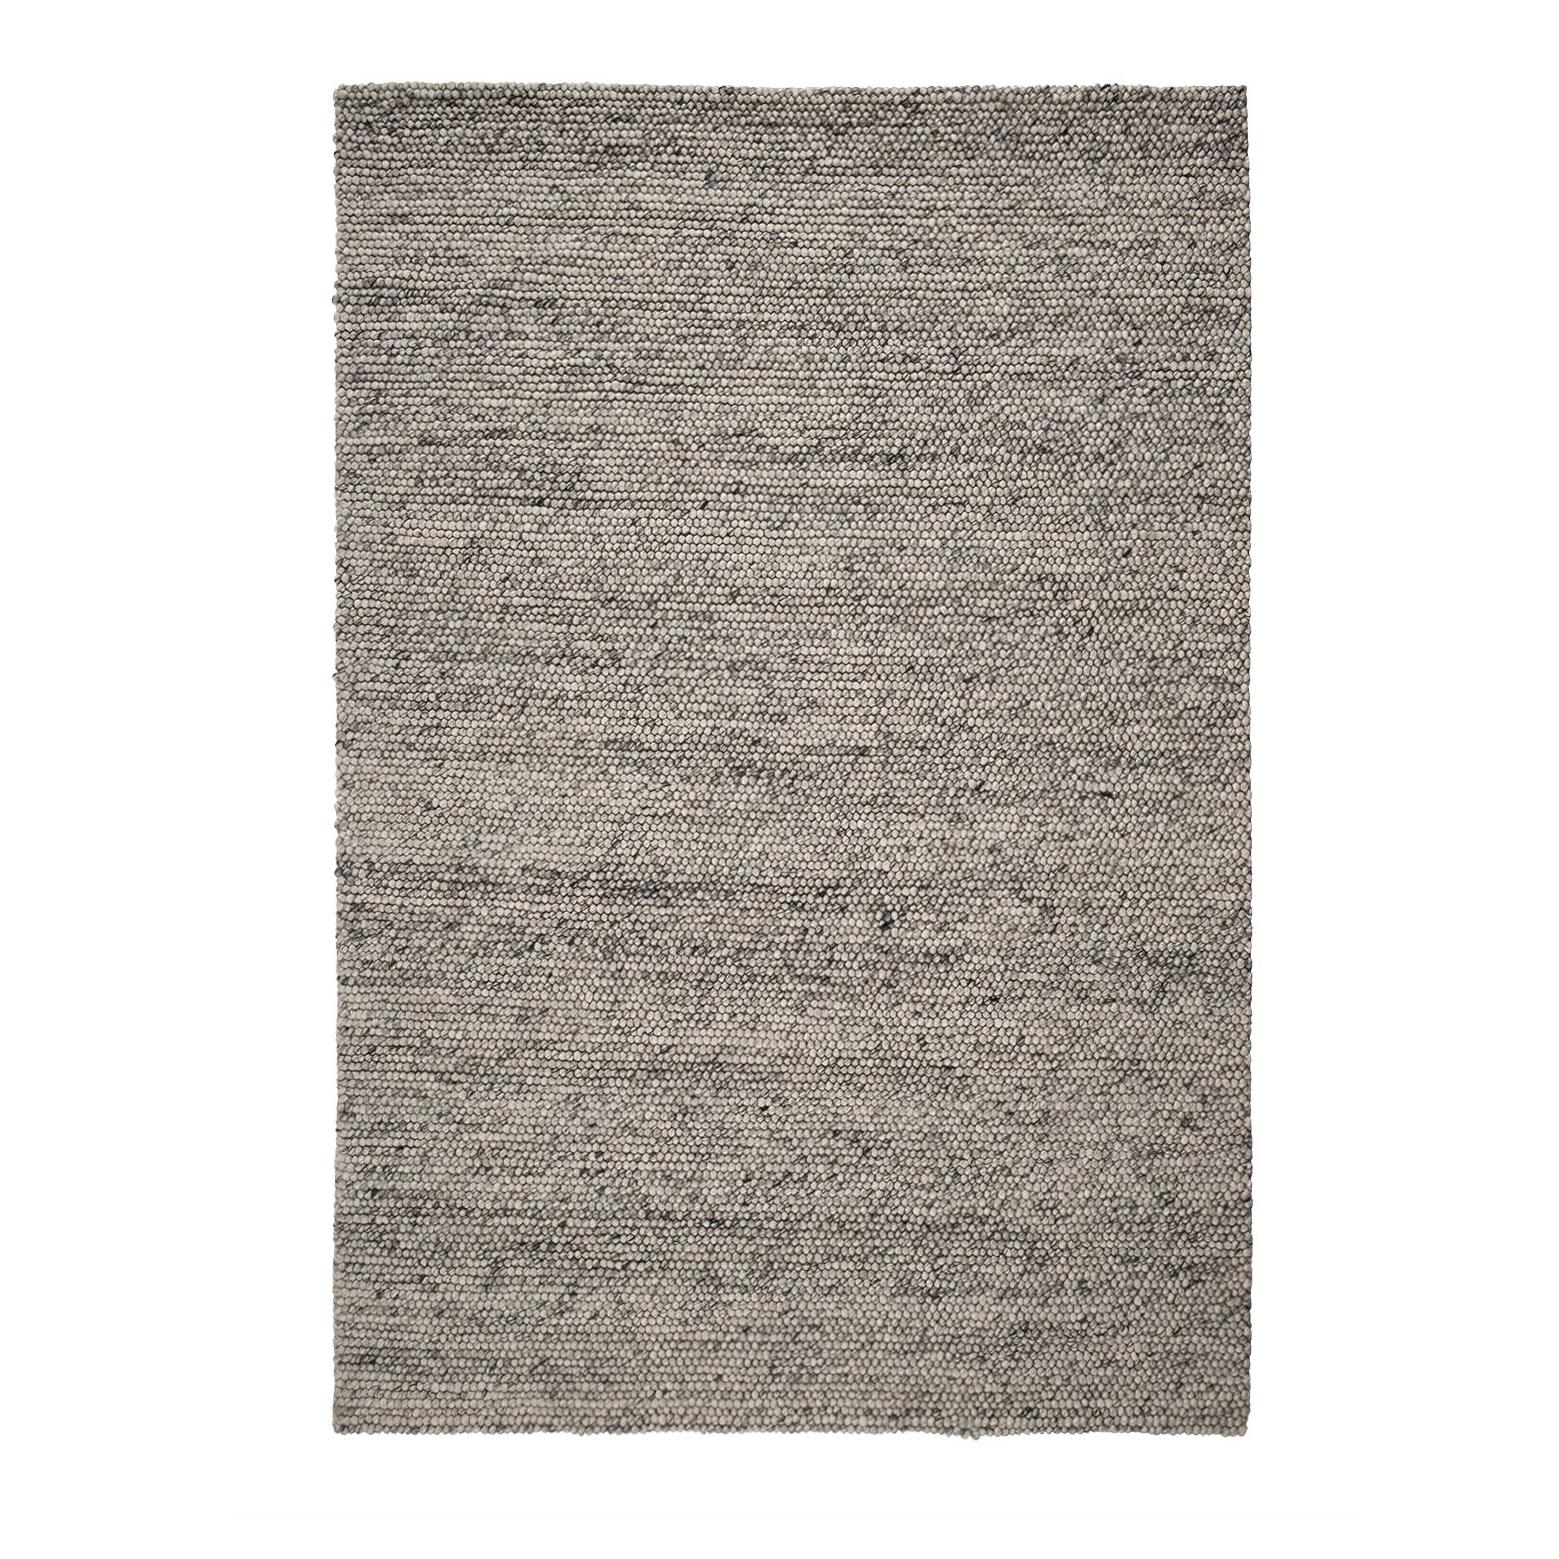 Shop_Grey Wool Rug.jpg